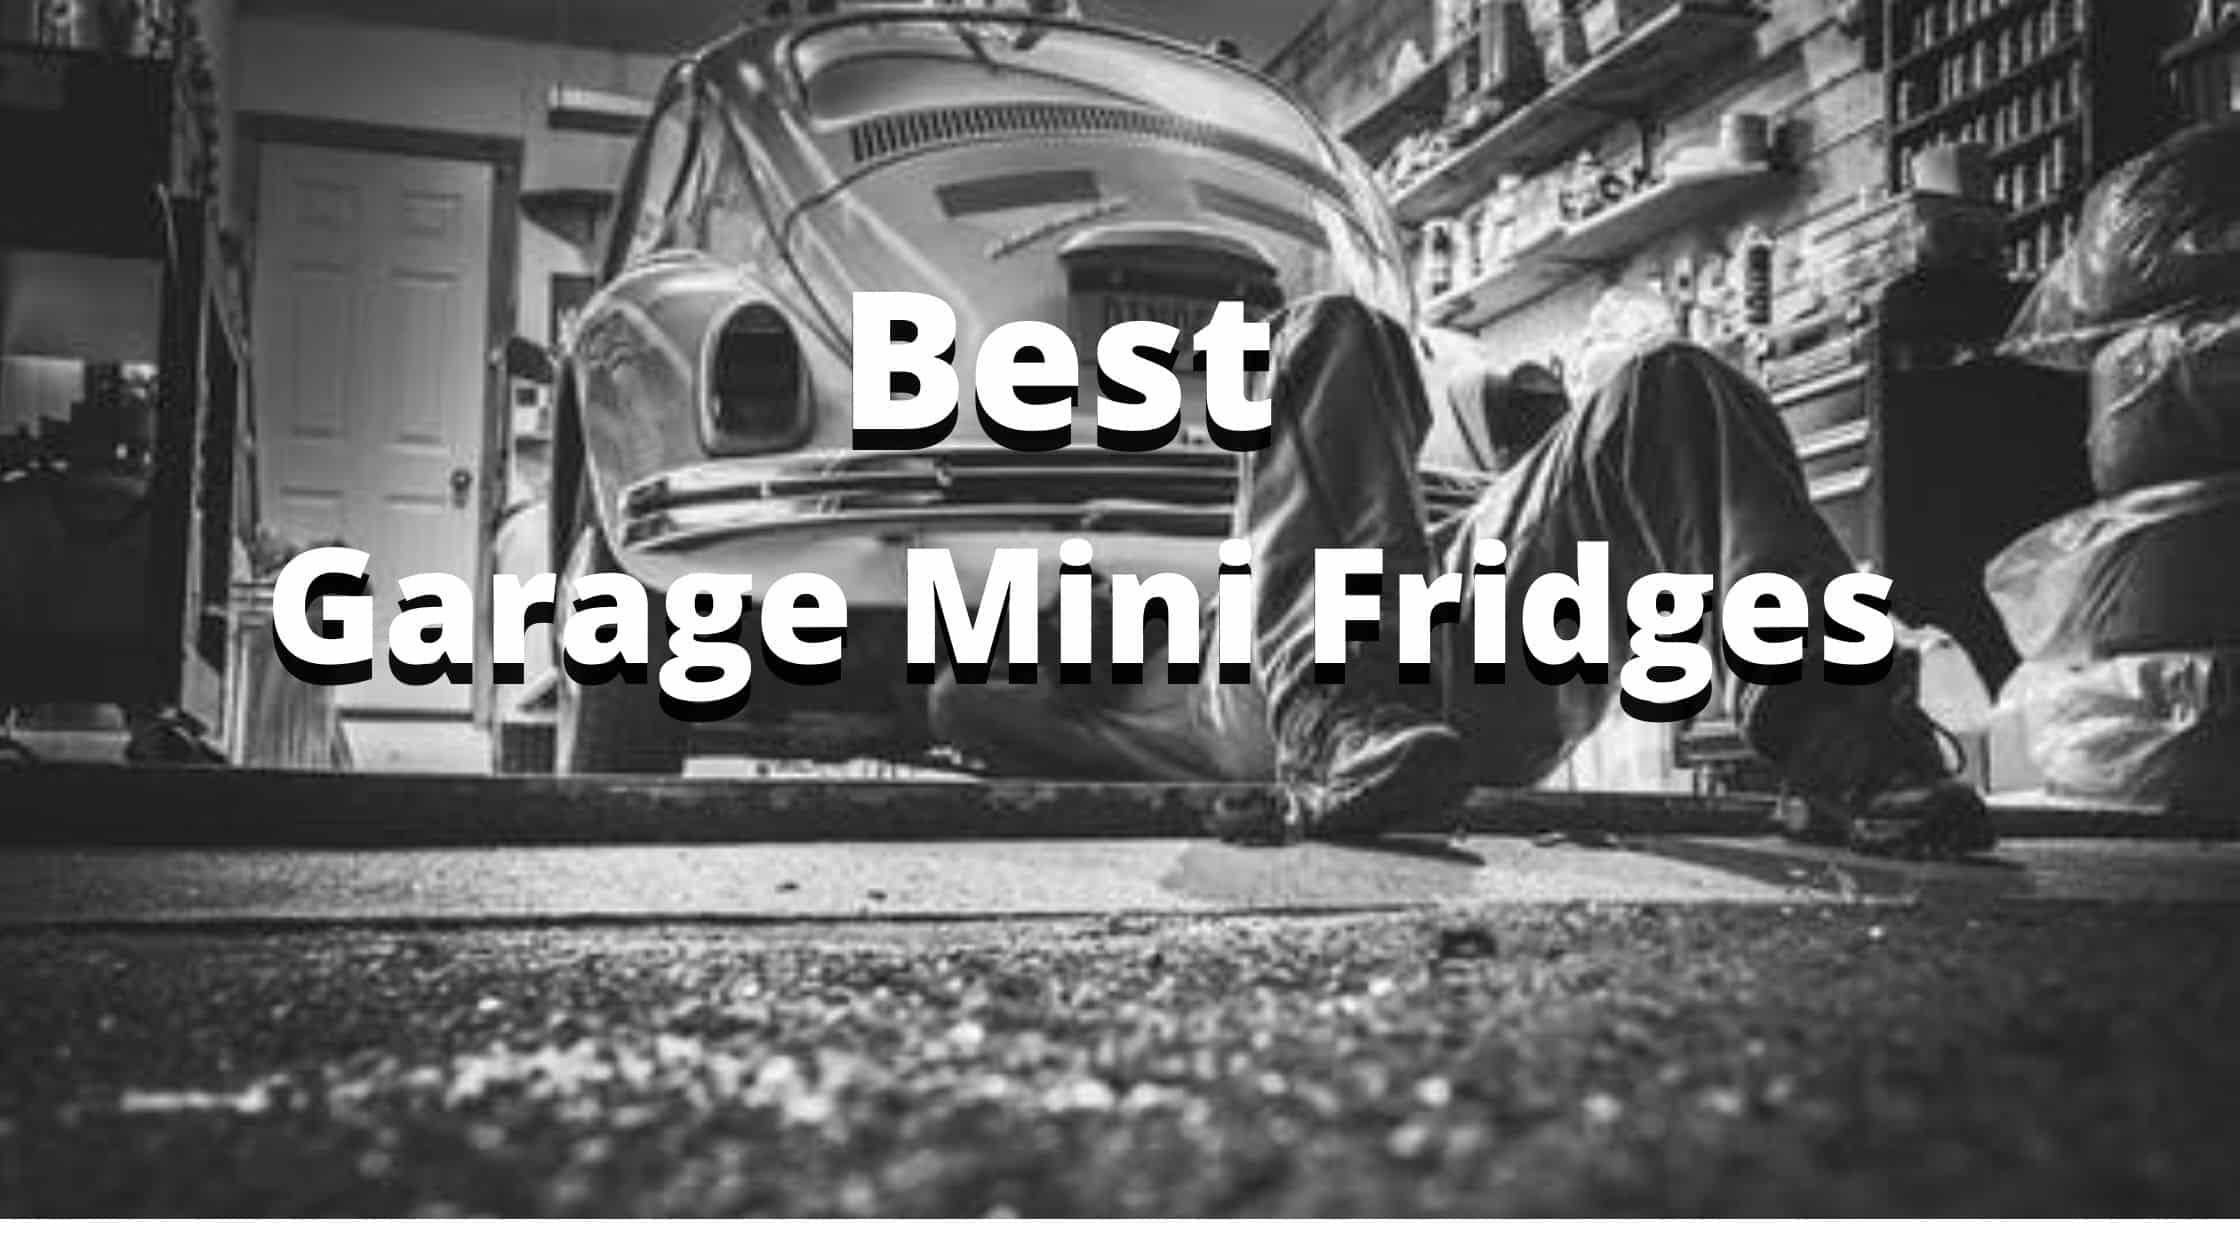 Best Garage Mini Fridges